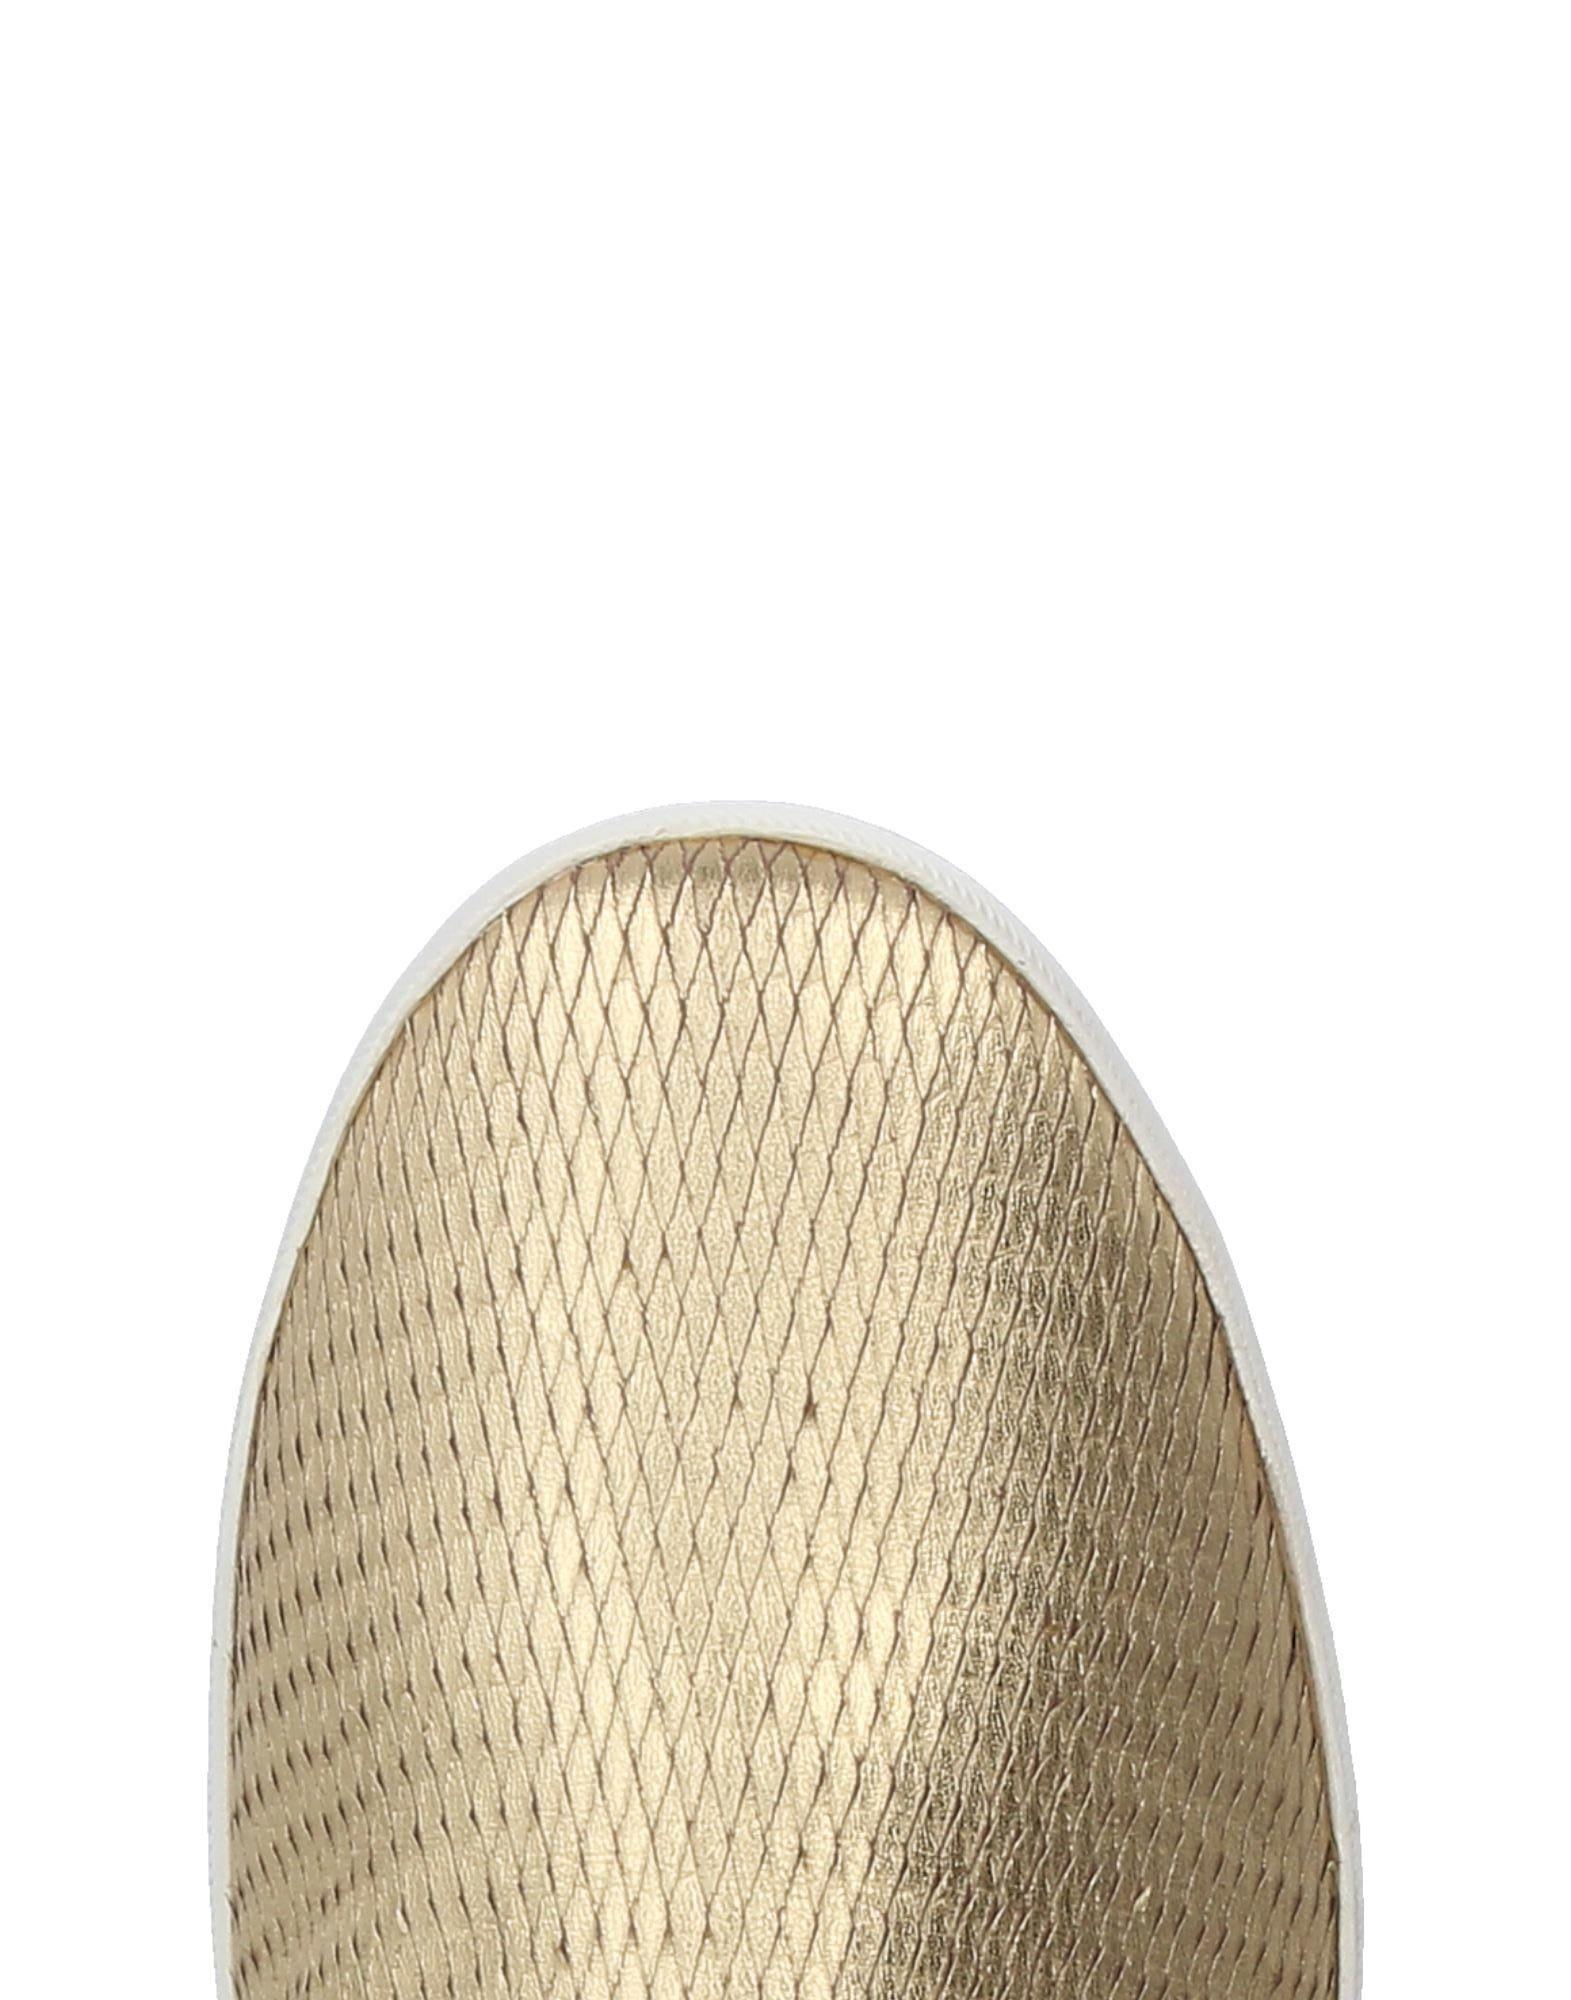 Steve Madden Sneakers Damen 11230151WP  11230151WP Damen  5b96de